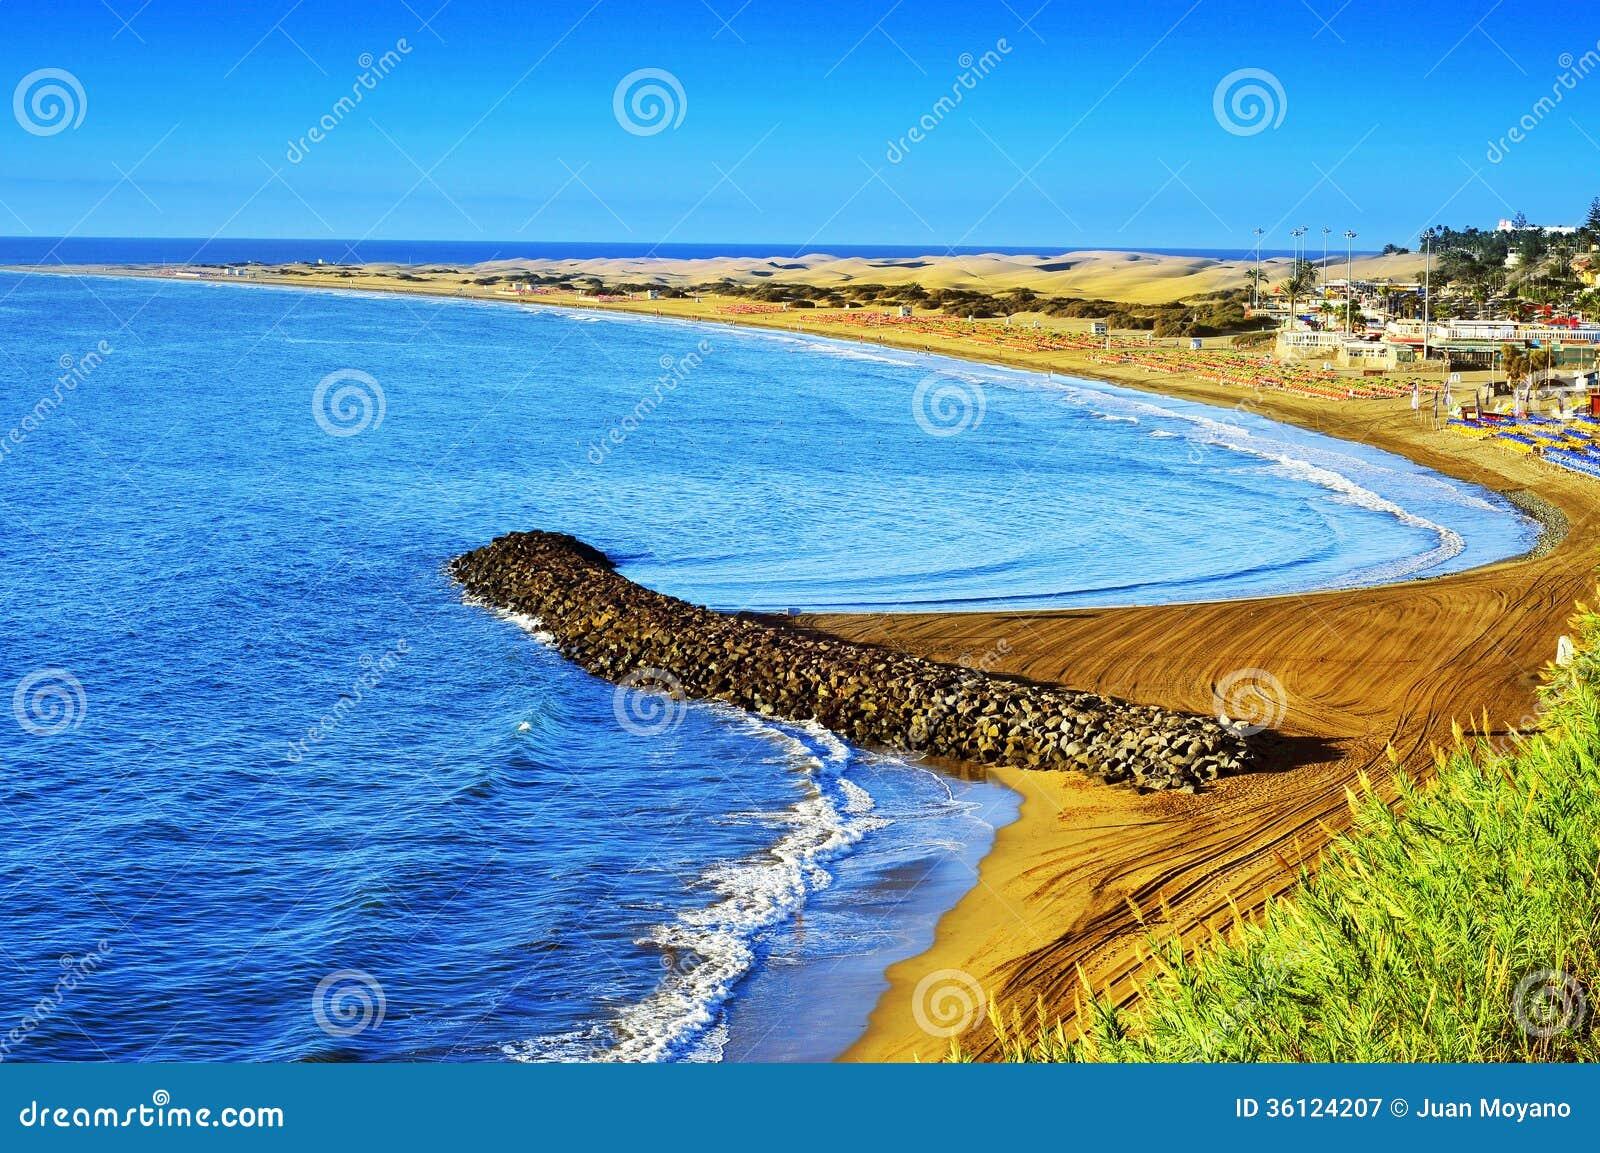 canary islands gran canaria playa del ingles and maspalomas